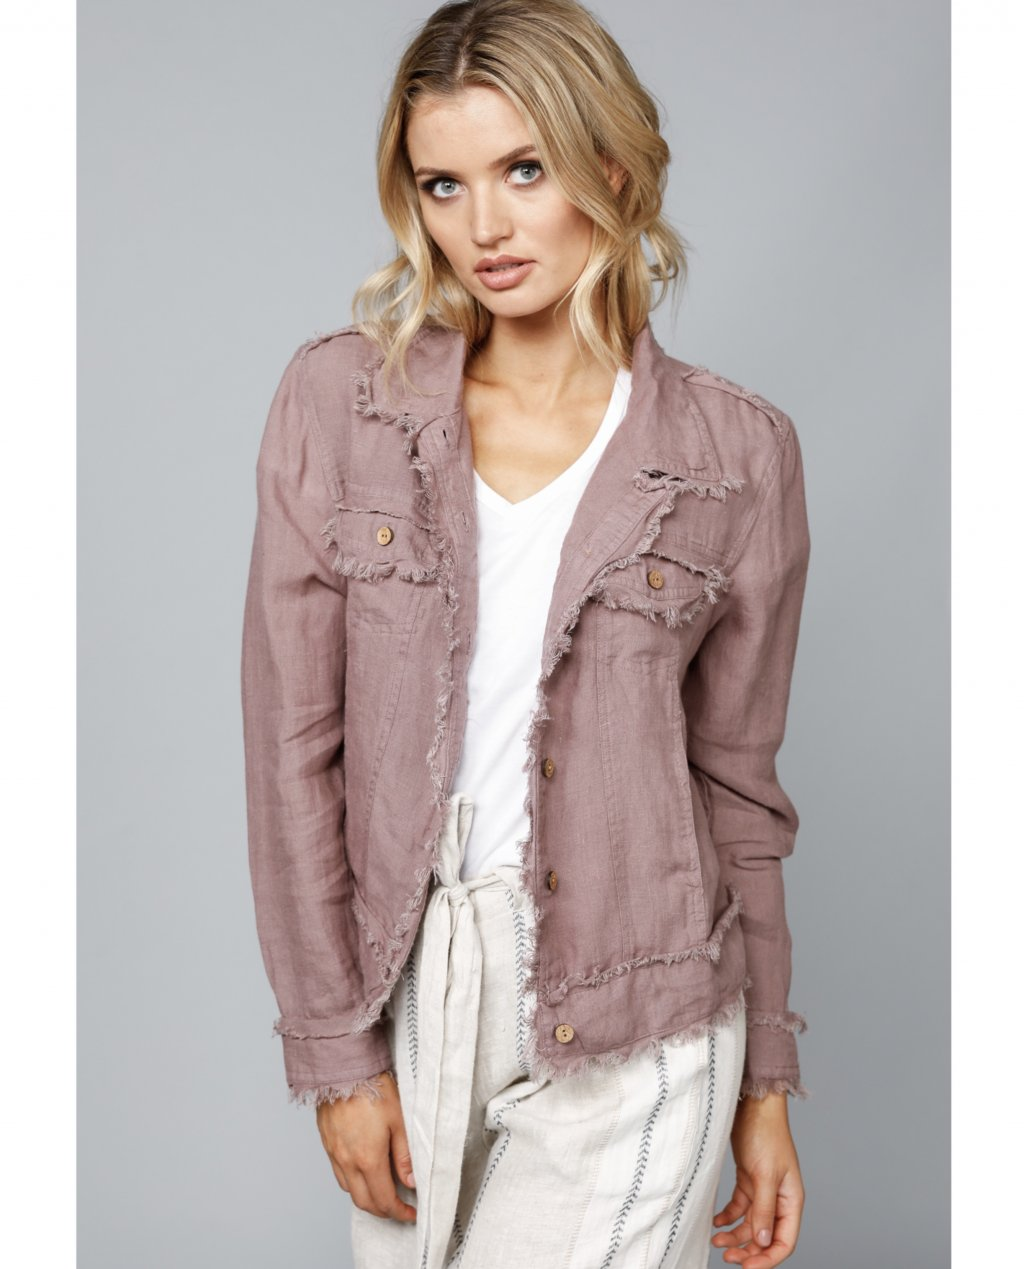 The Shanty Corporation | Monza Jacket | Sienna | 100% Linen